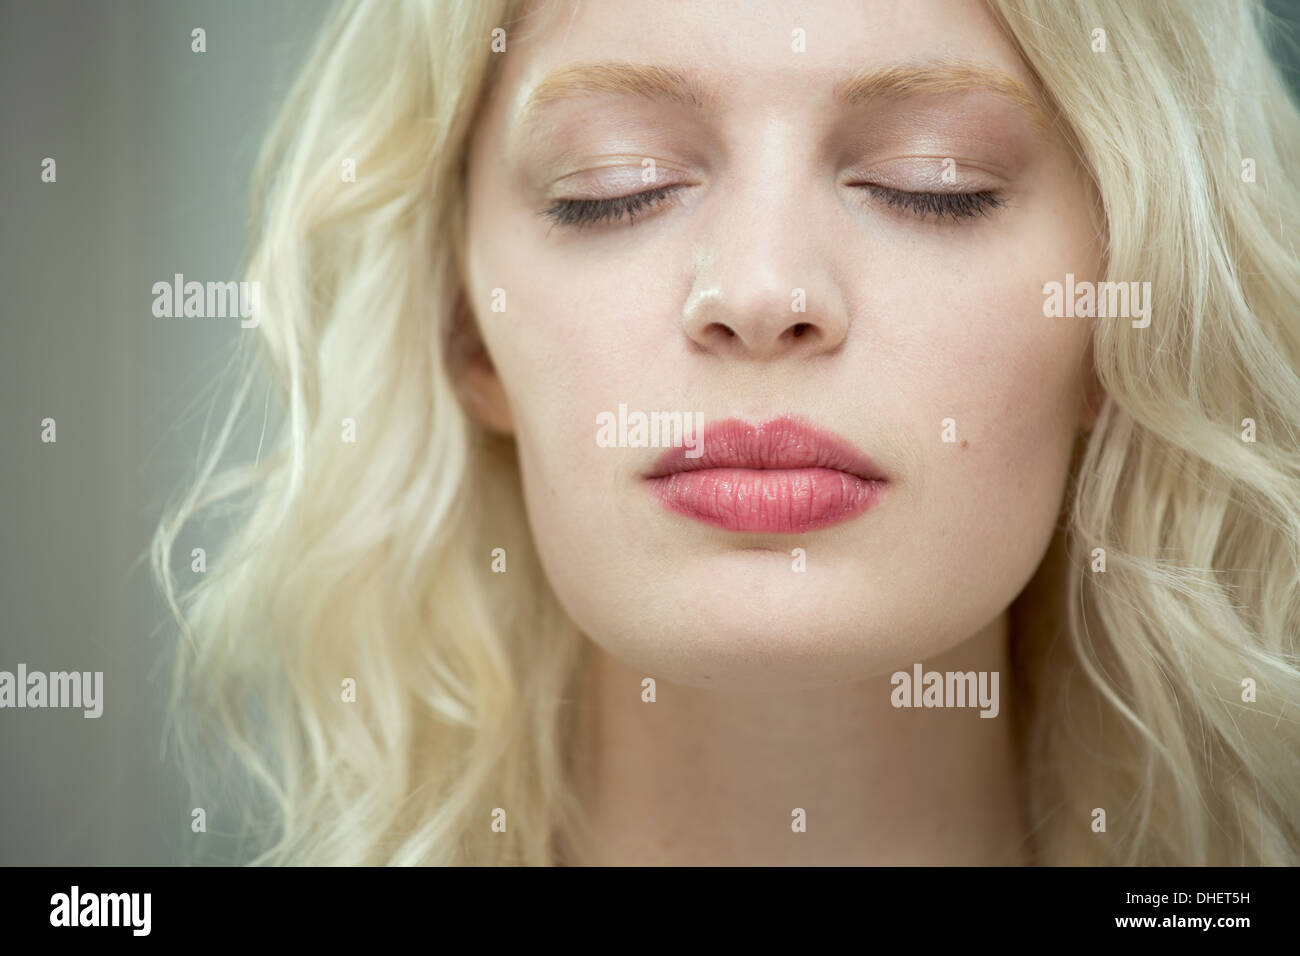 Junge Frau mit geschlossenen Augen Stockbild